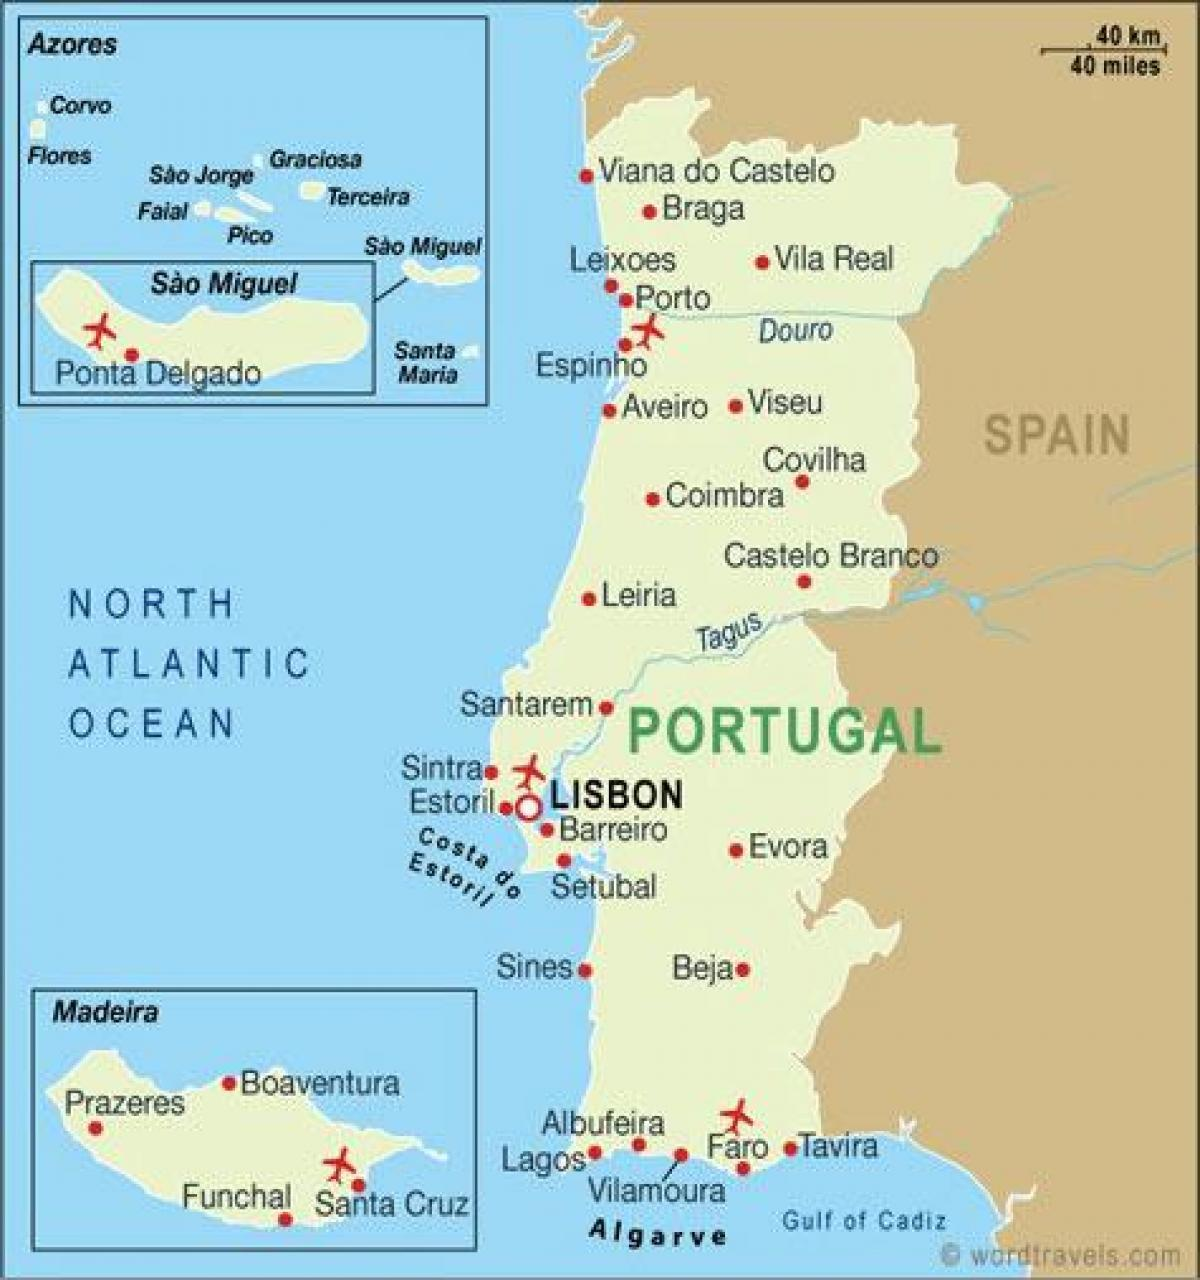 Karta Europa Portugal.Portugal Flygplatser Karta Karta Over Flygplatser I Portugal I